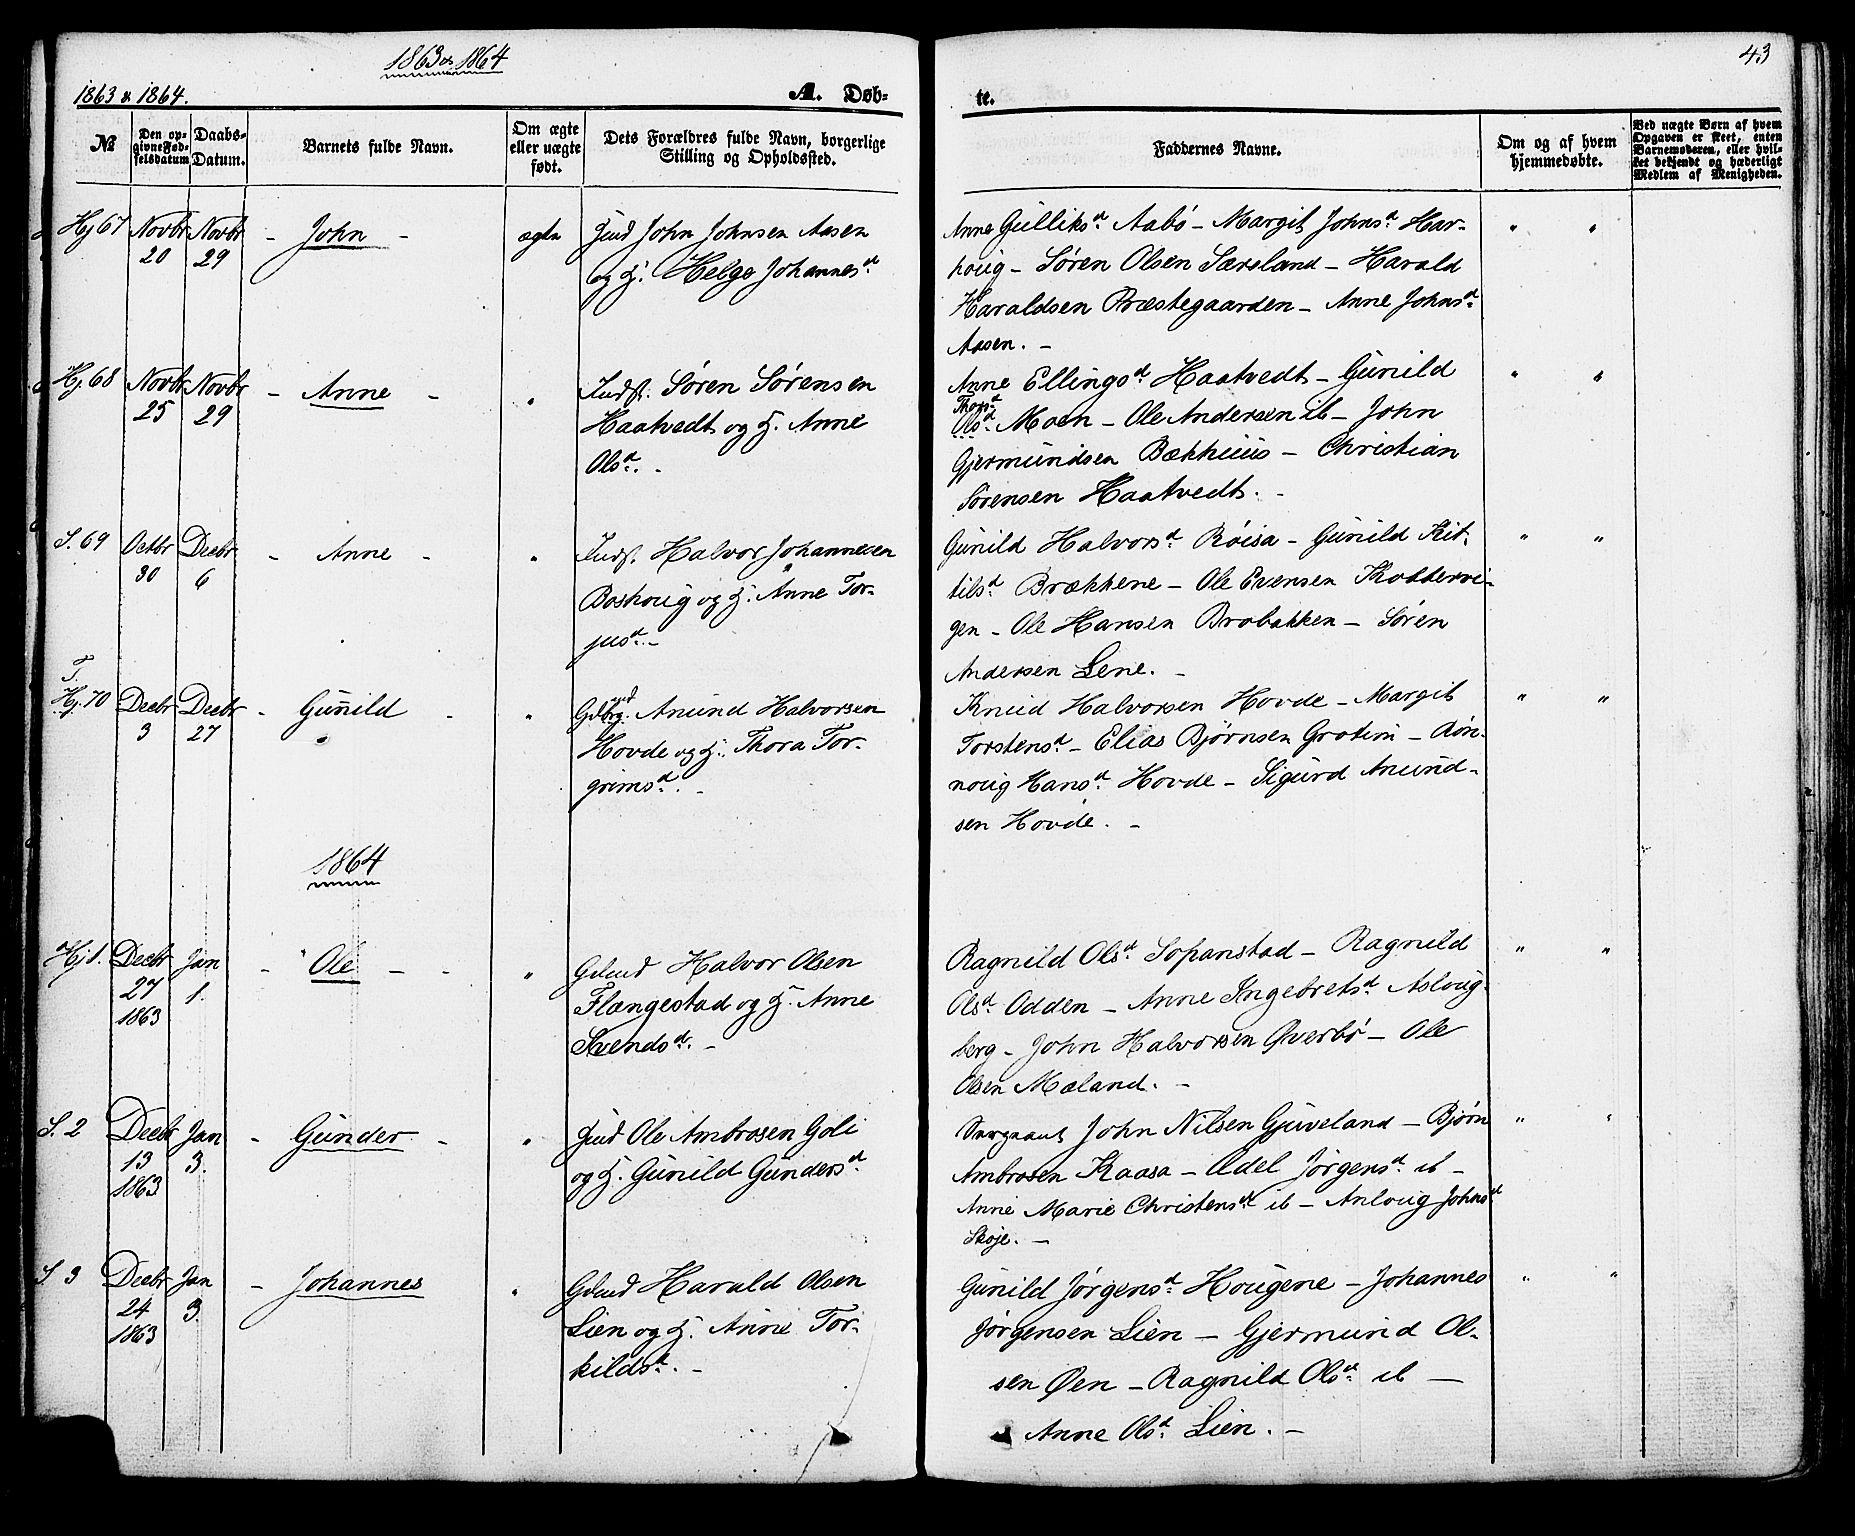 SAKO, Hjartdal kirkebøker, F/Fa/L0009: Ministerialbok nr. I 9, 1860-1879, s. 43